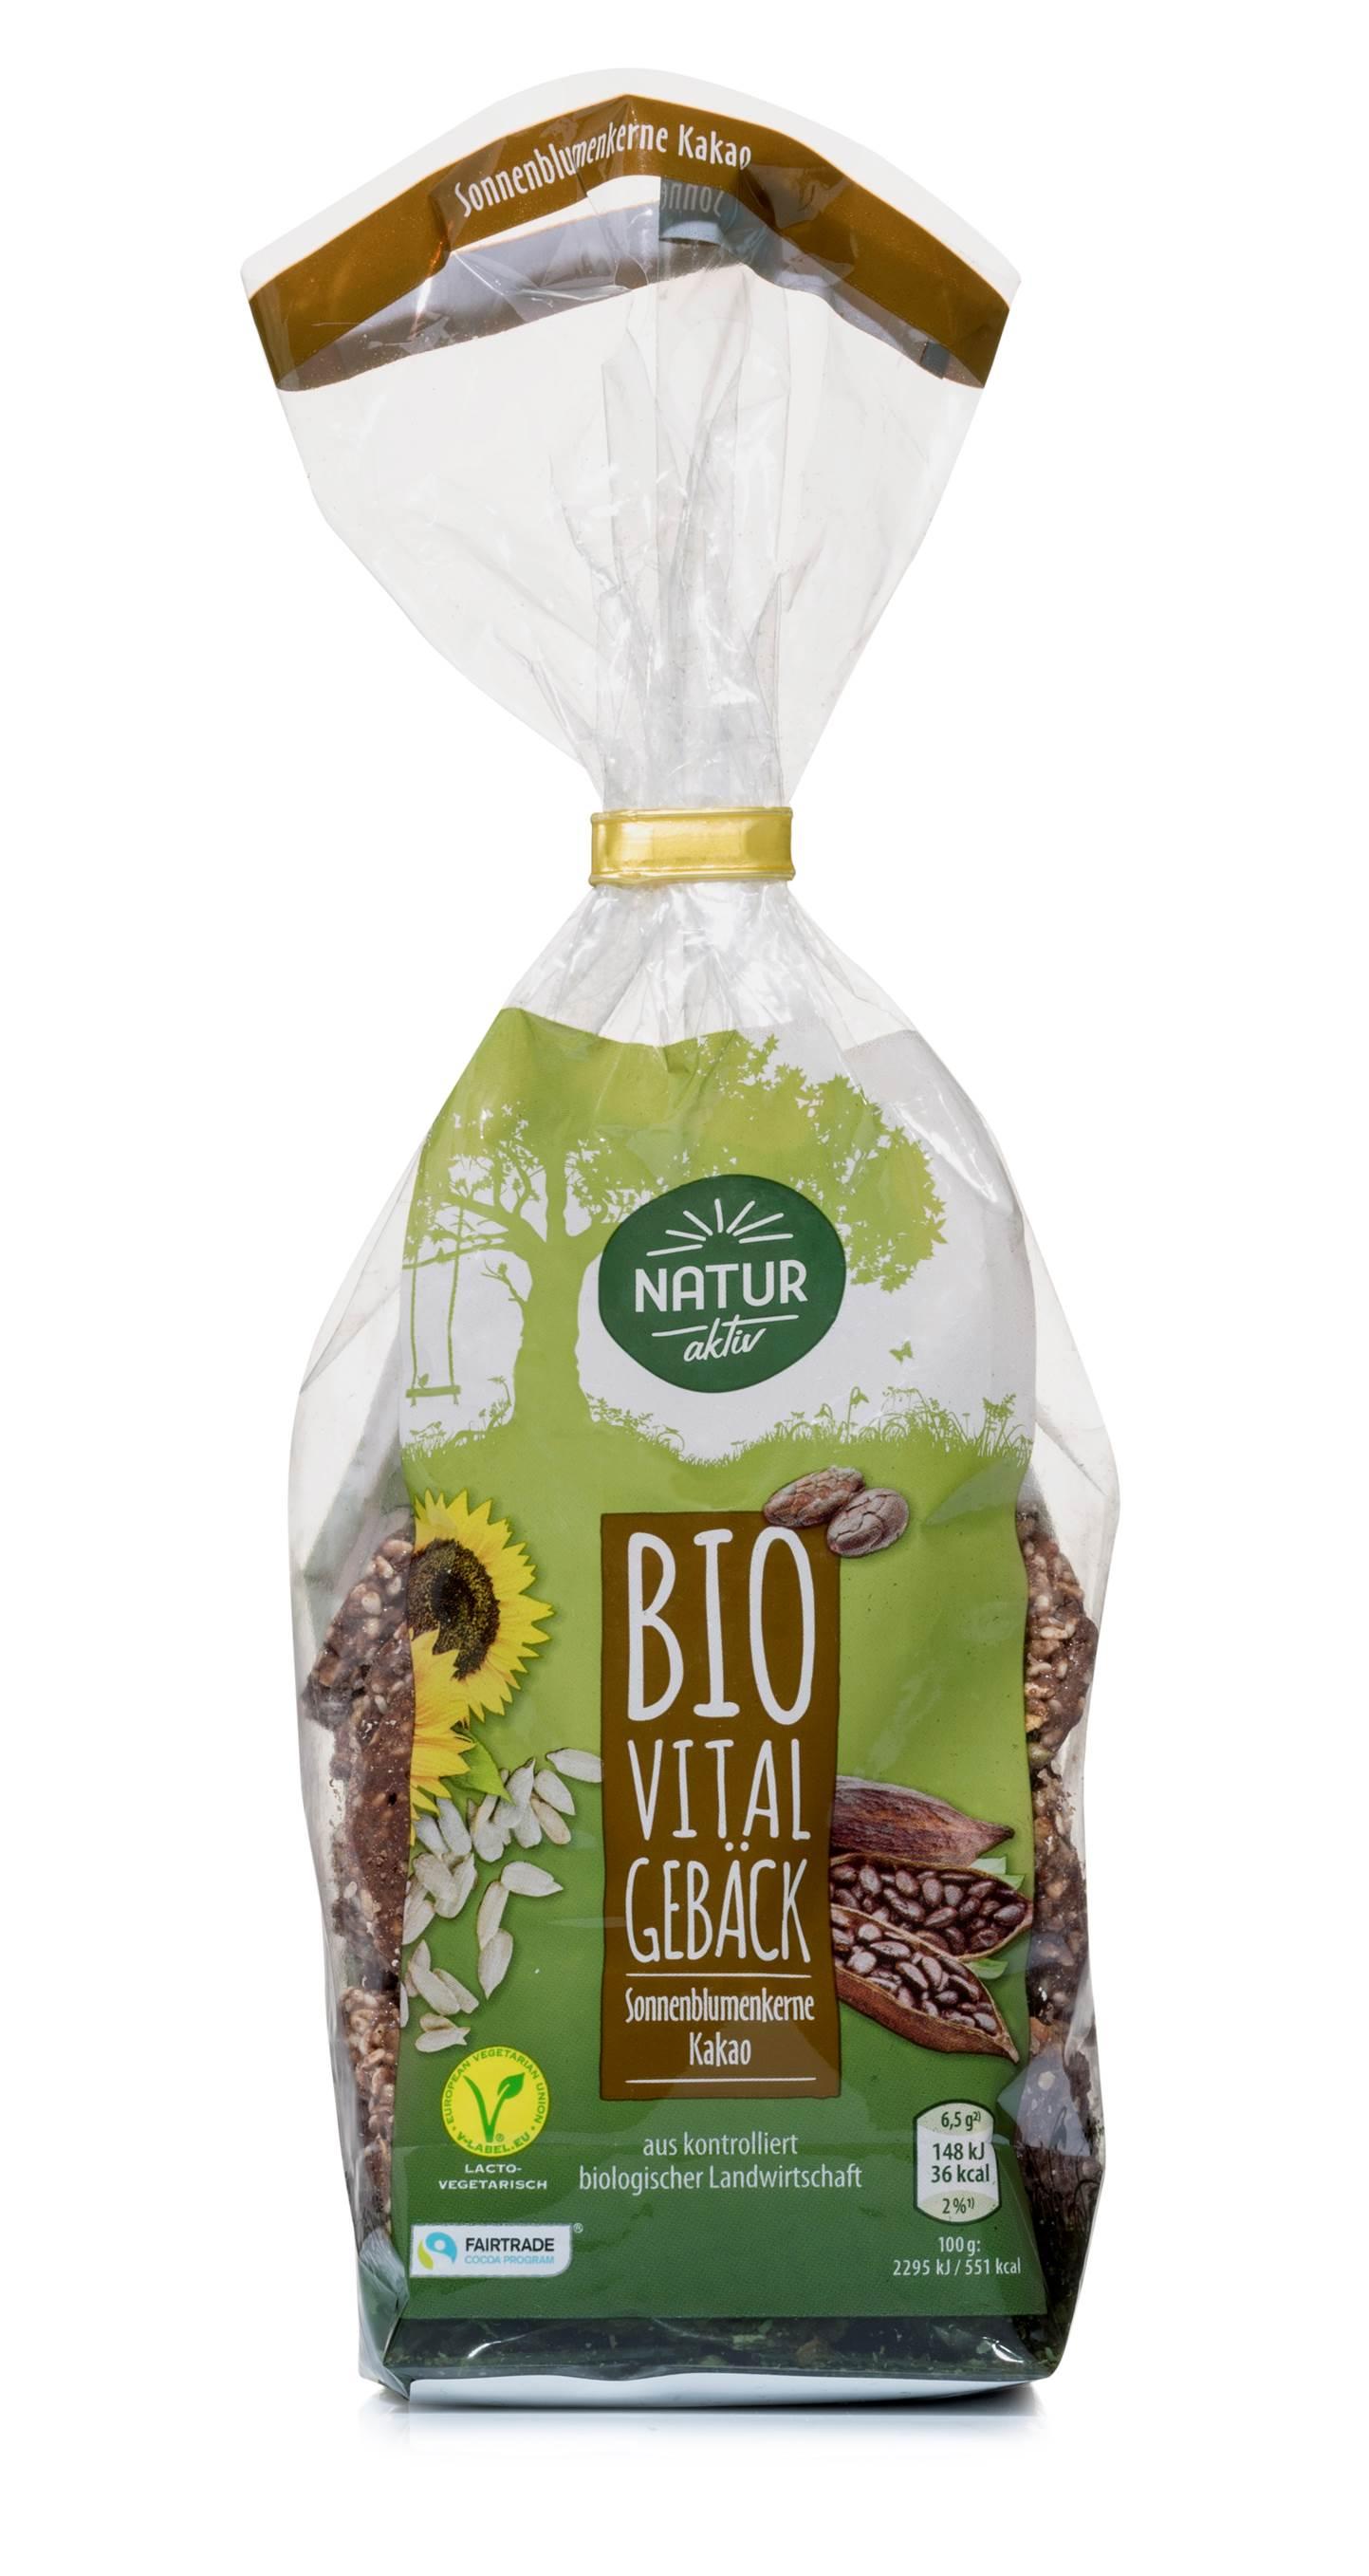 Vitalgebäck Sonnenblumenkerne Kakao